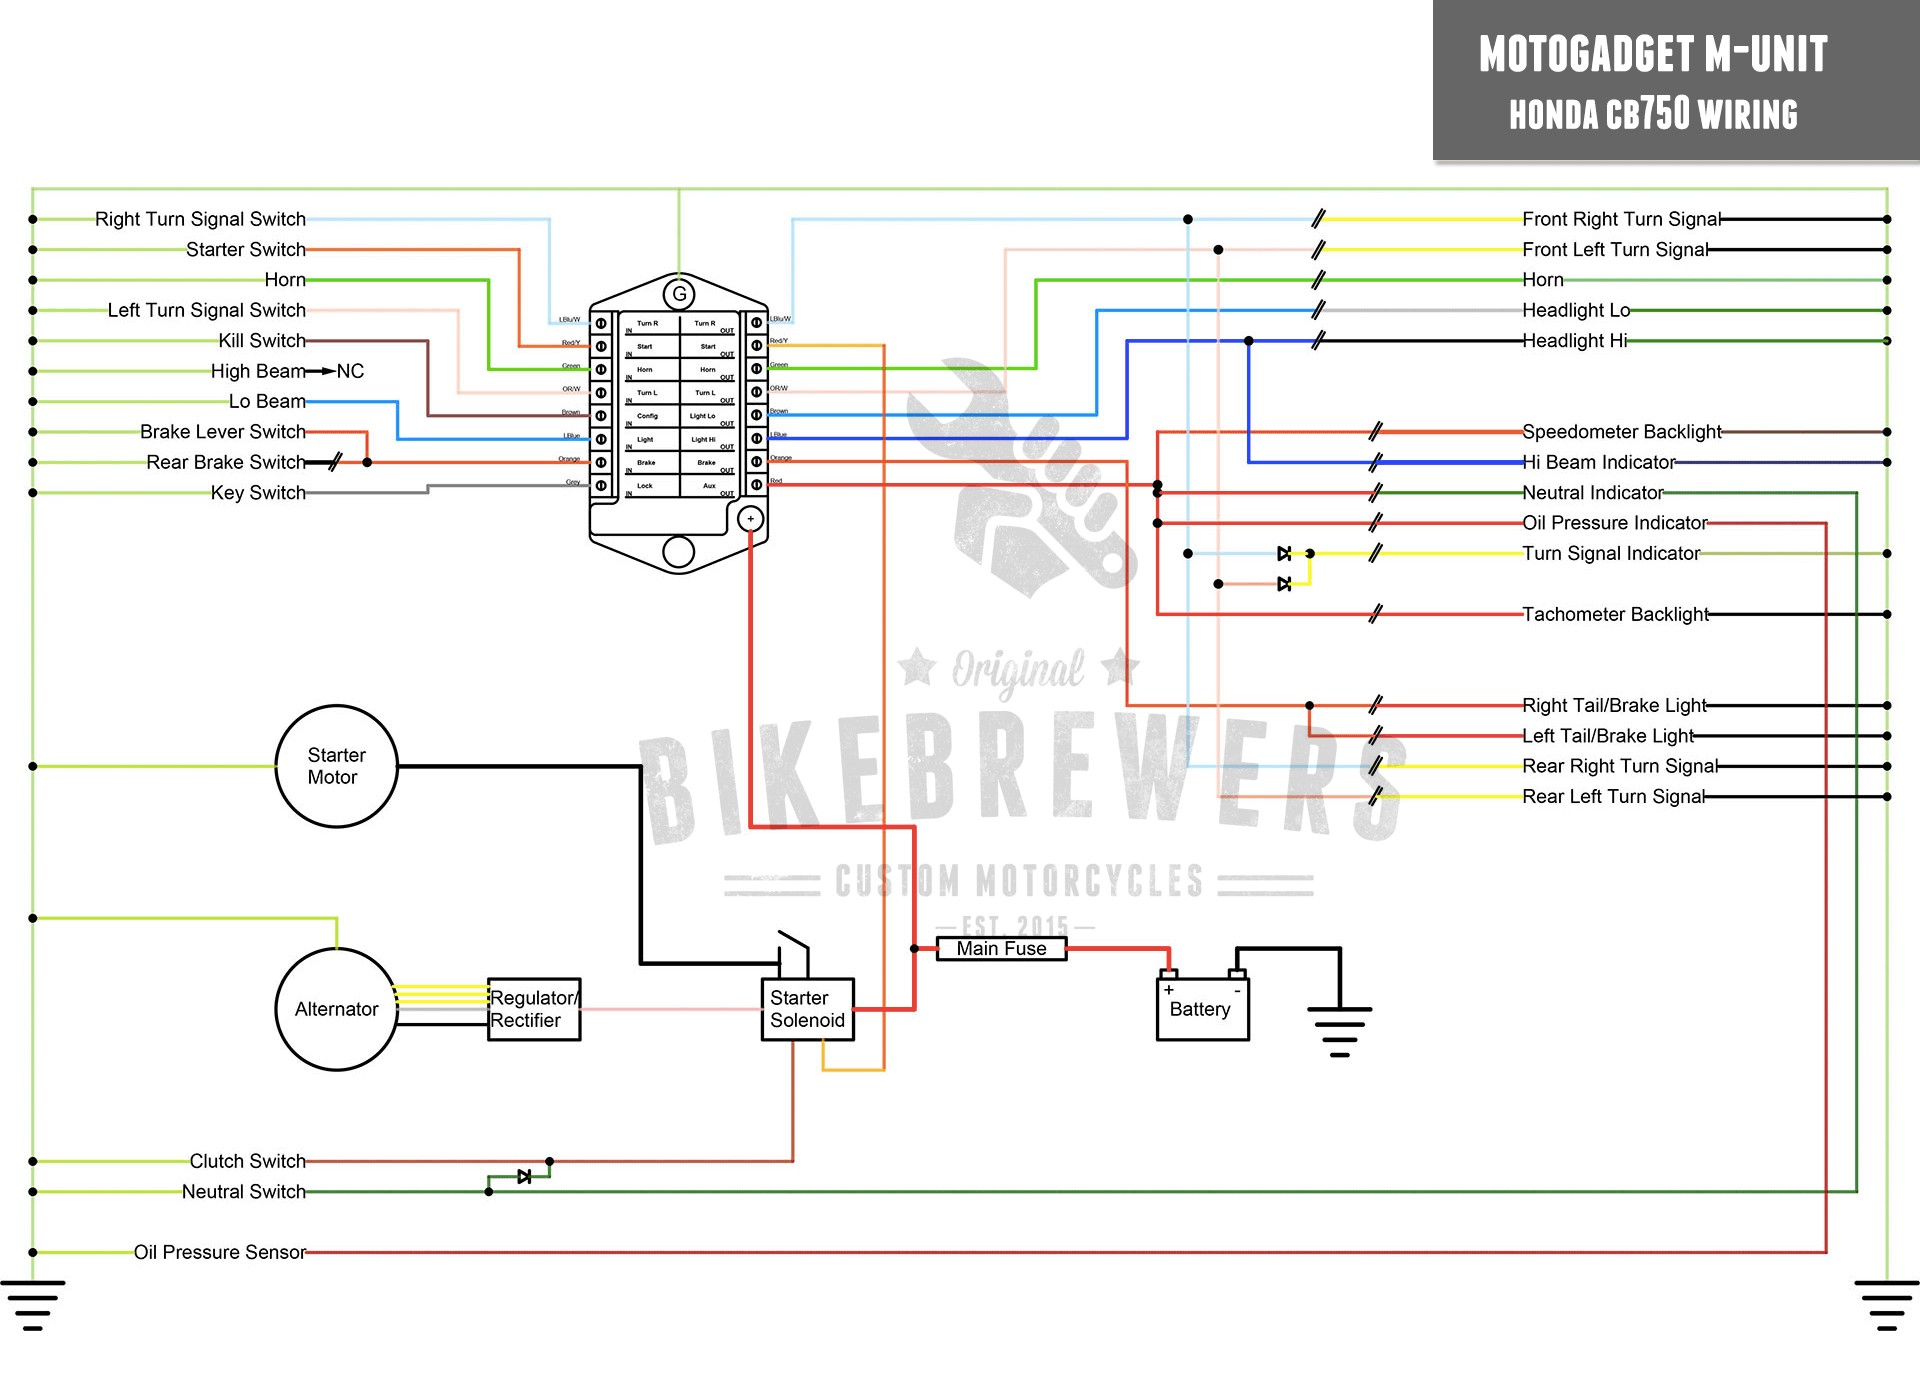 Reese Pod Ke Controller Wiring Diagram. 2003 E150 Cargo Van ... on